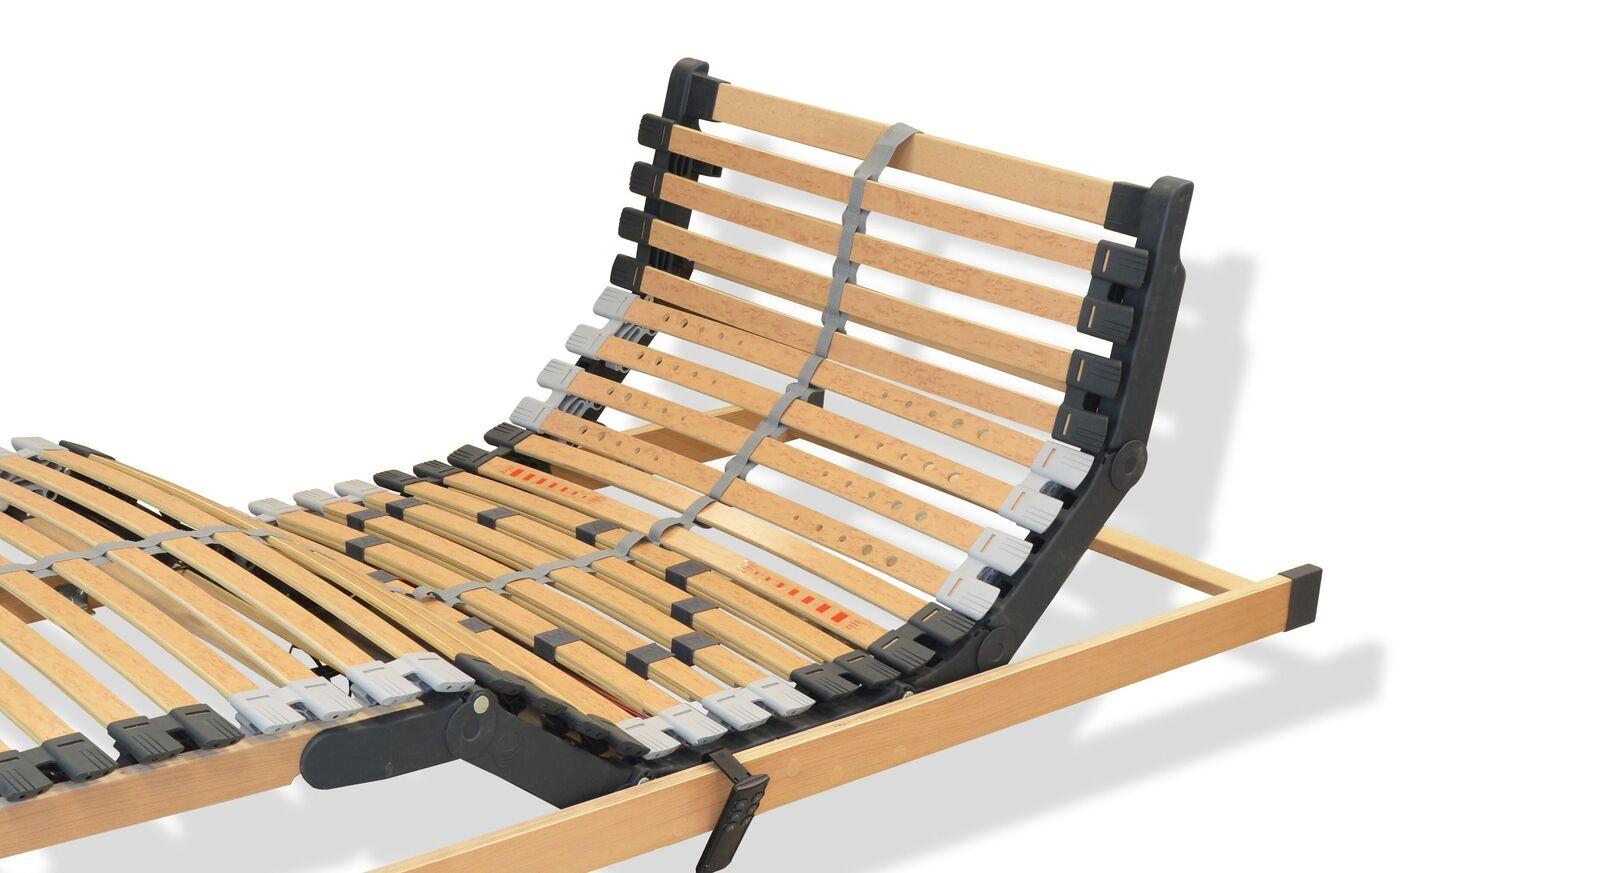 Bettkasten-Lattenrost youSleep Motor slim aus robustem Birkenholz